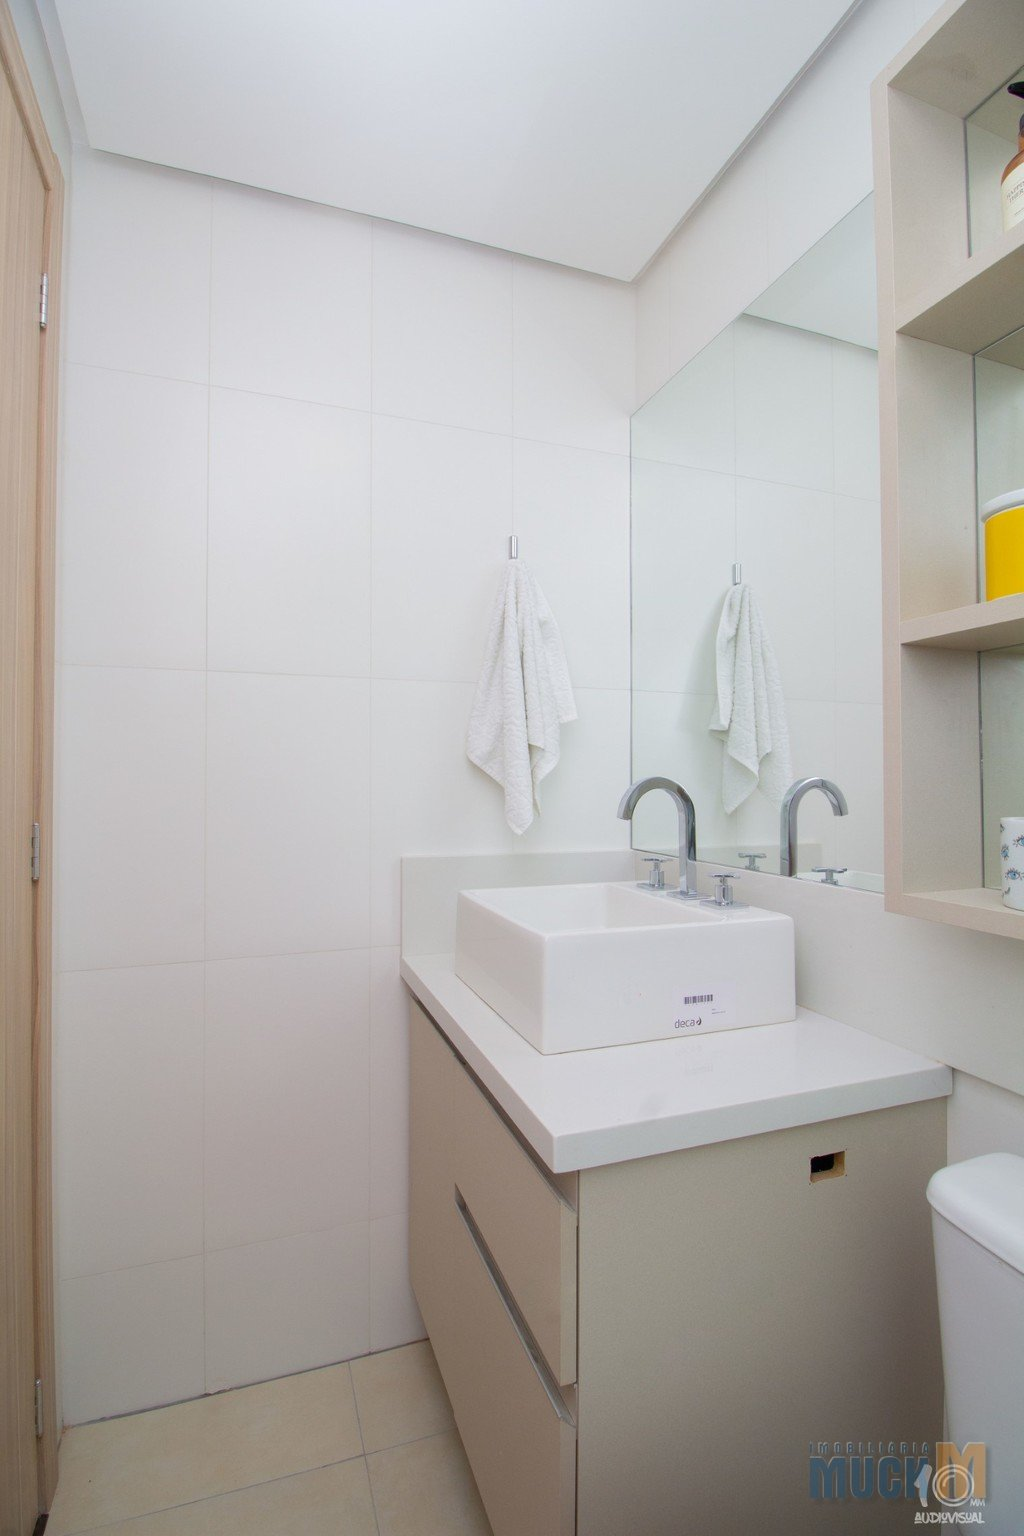 076_banheiro.jpg